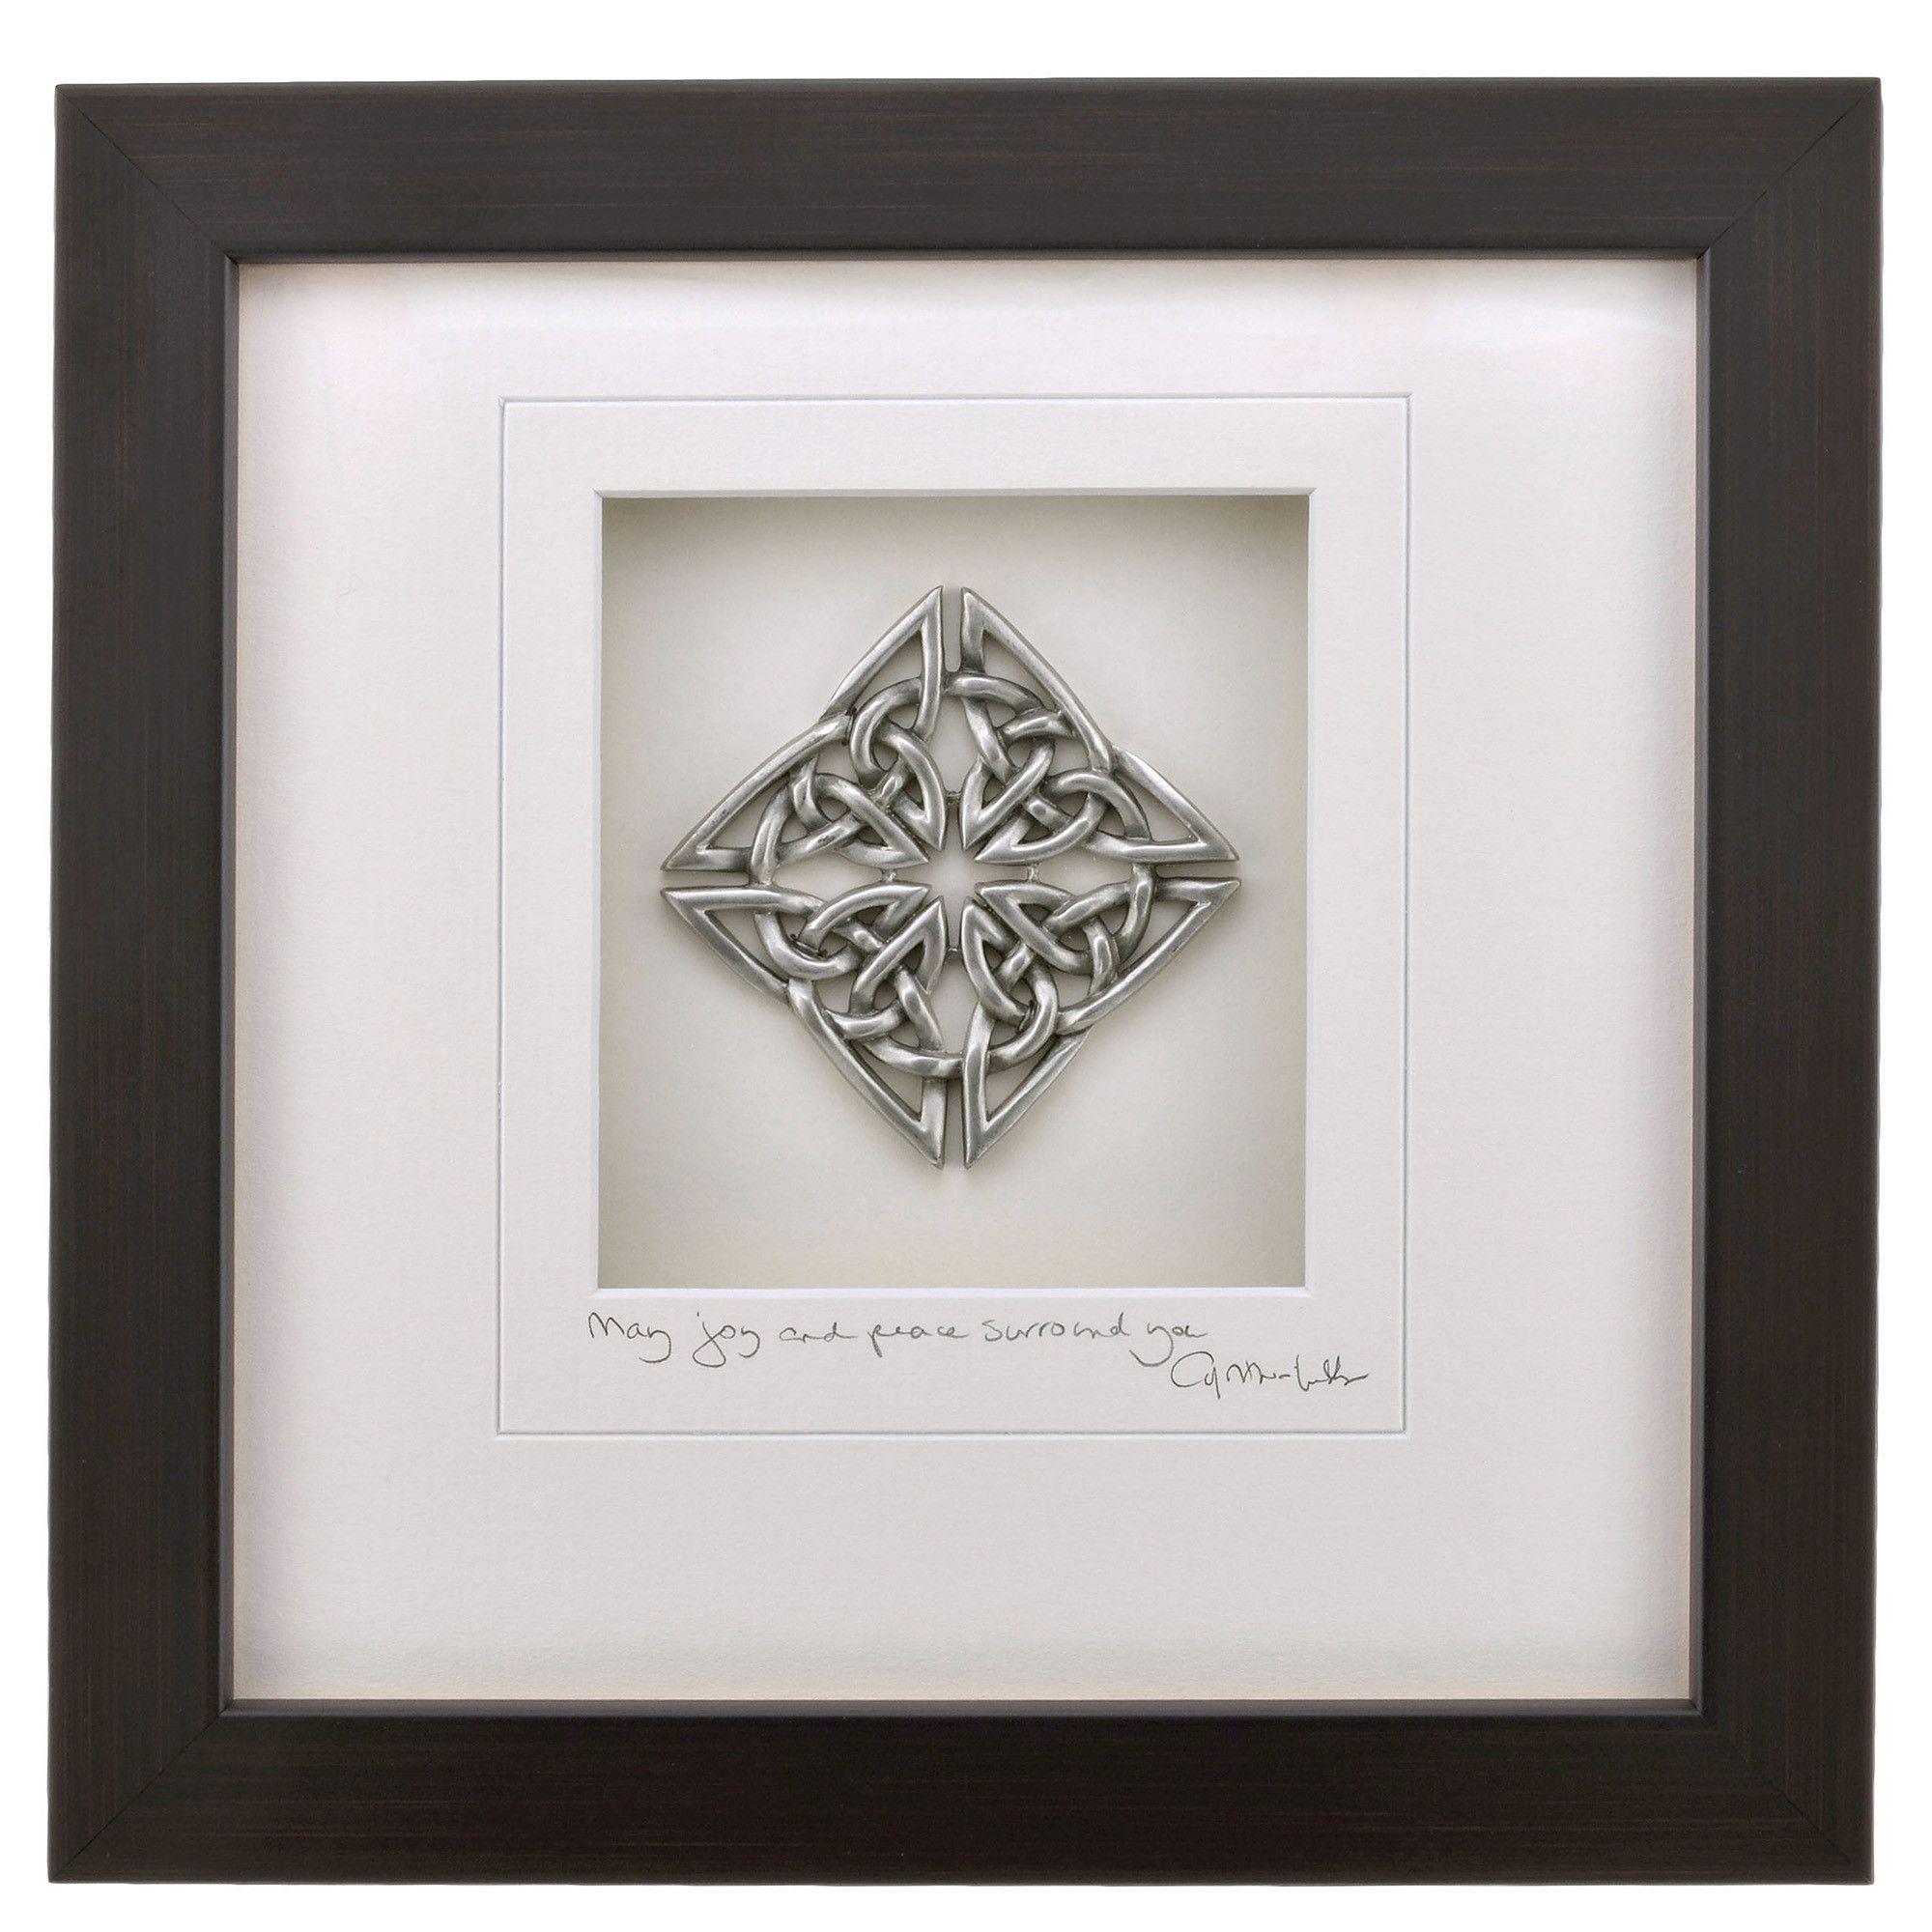 Cynthia webb designs celtic knot pewter wall art celtic knots